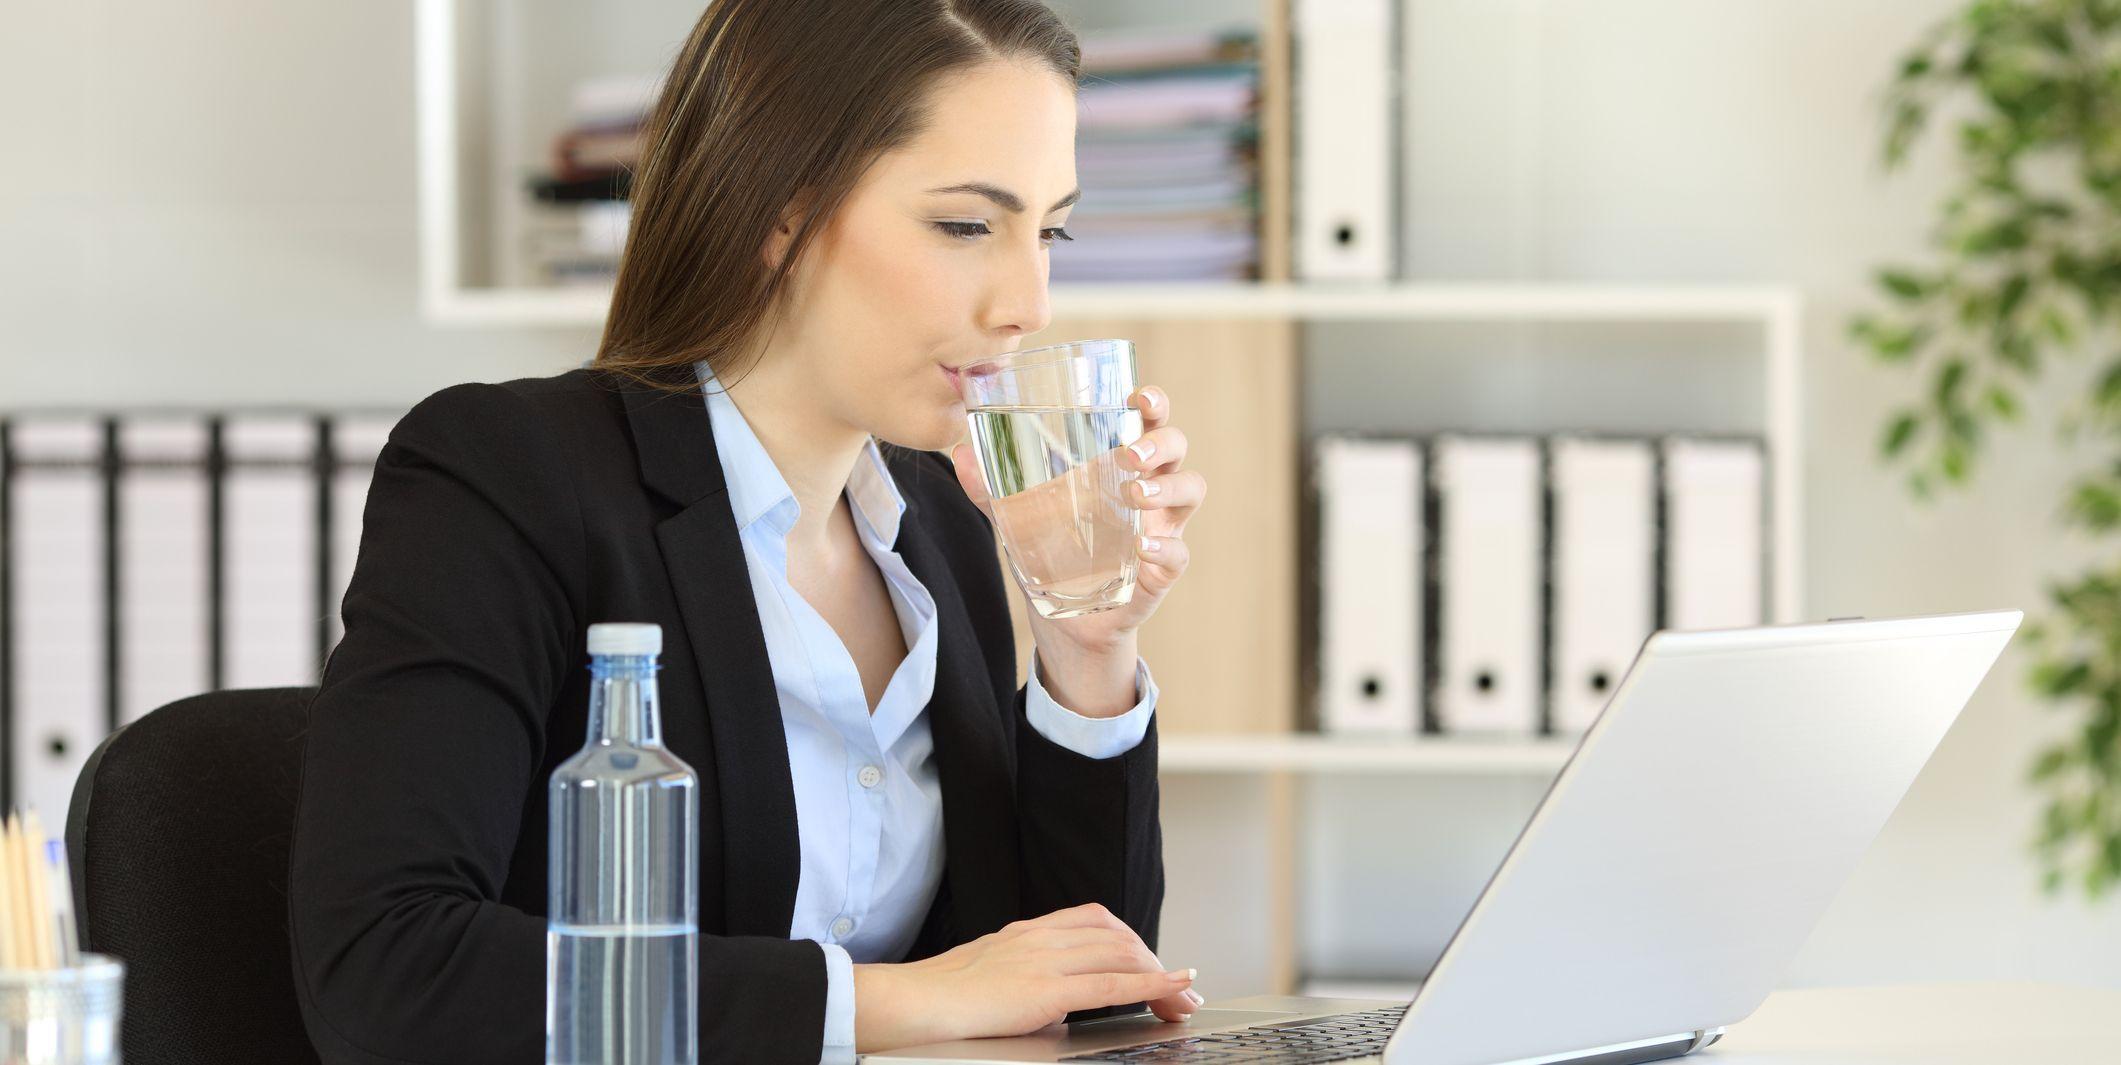 Office worker drinking water working on line